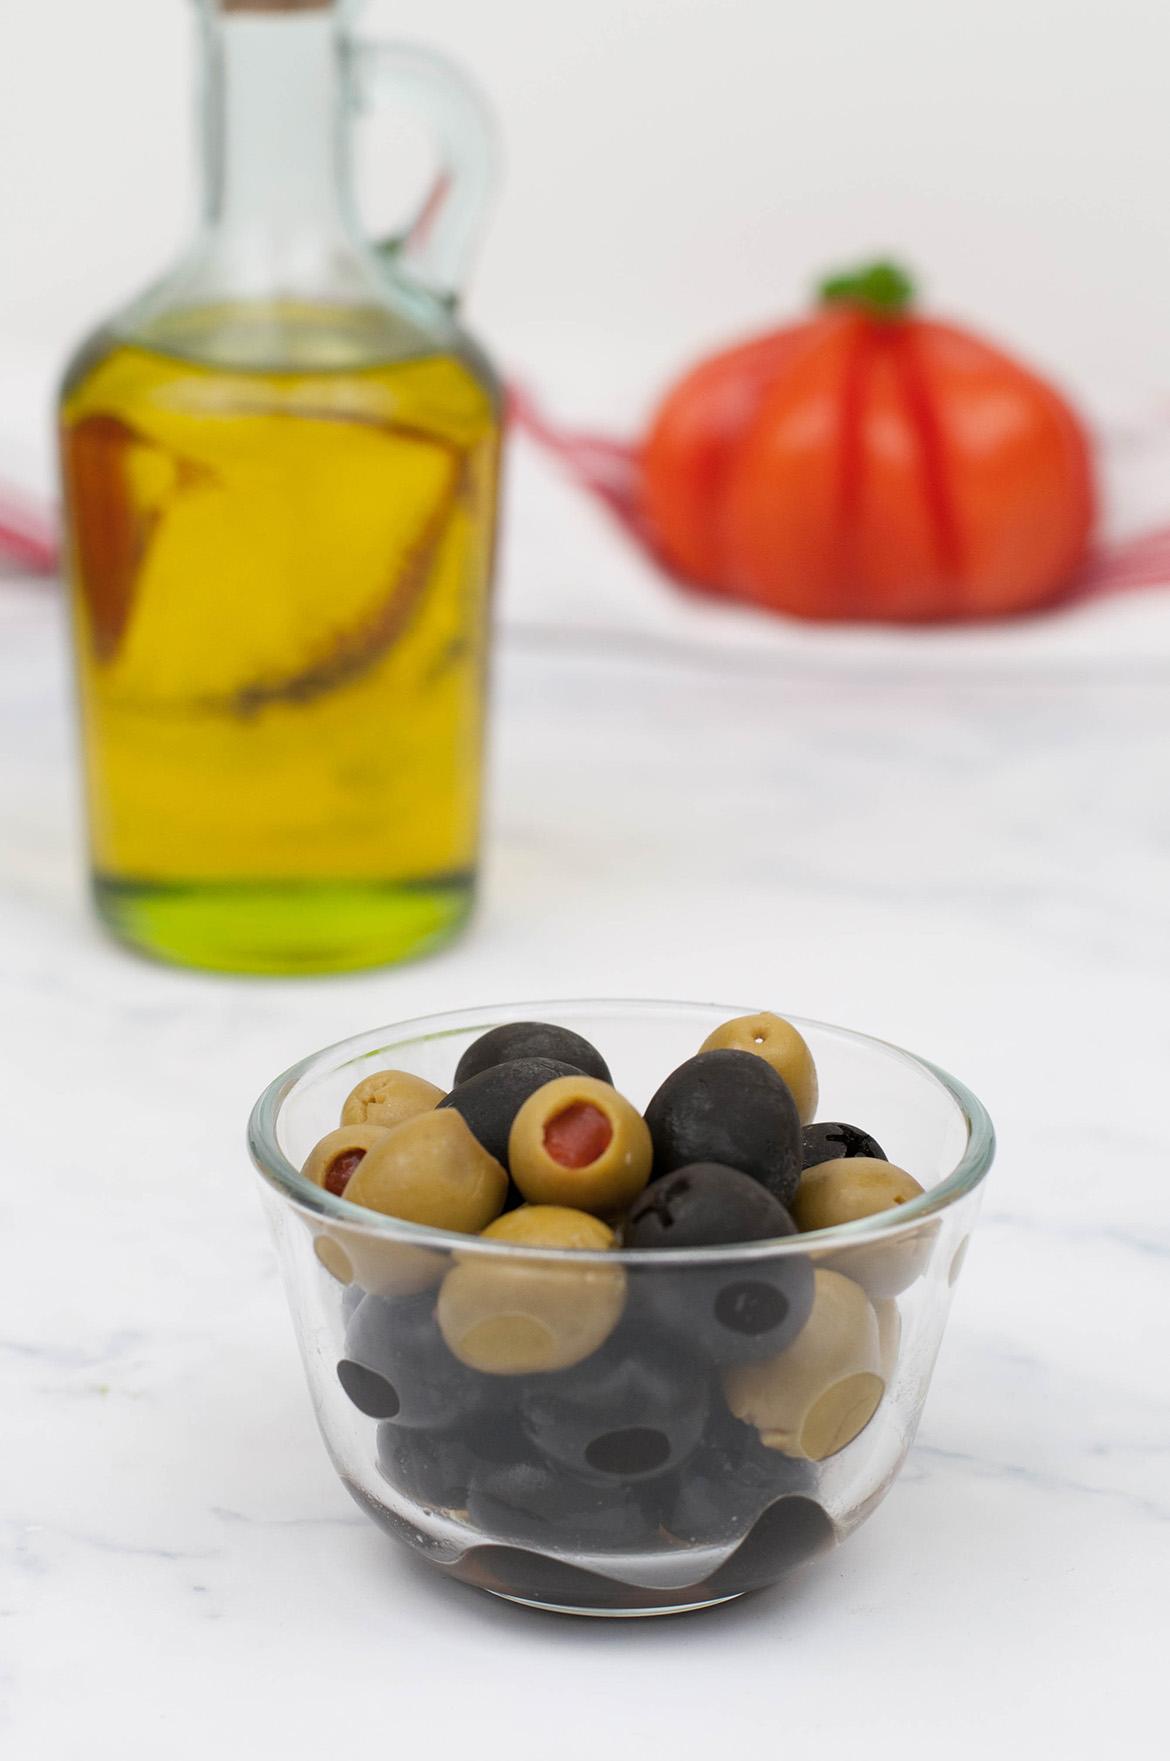 Oliven für Tomaten-Mozzarella-Salat mit Gremolata